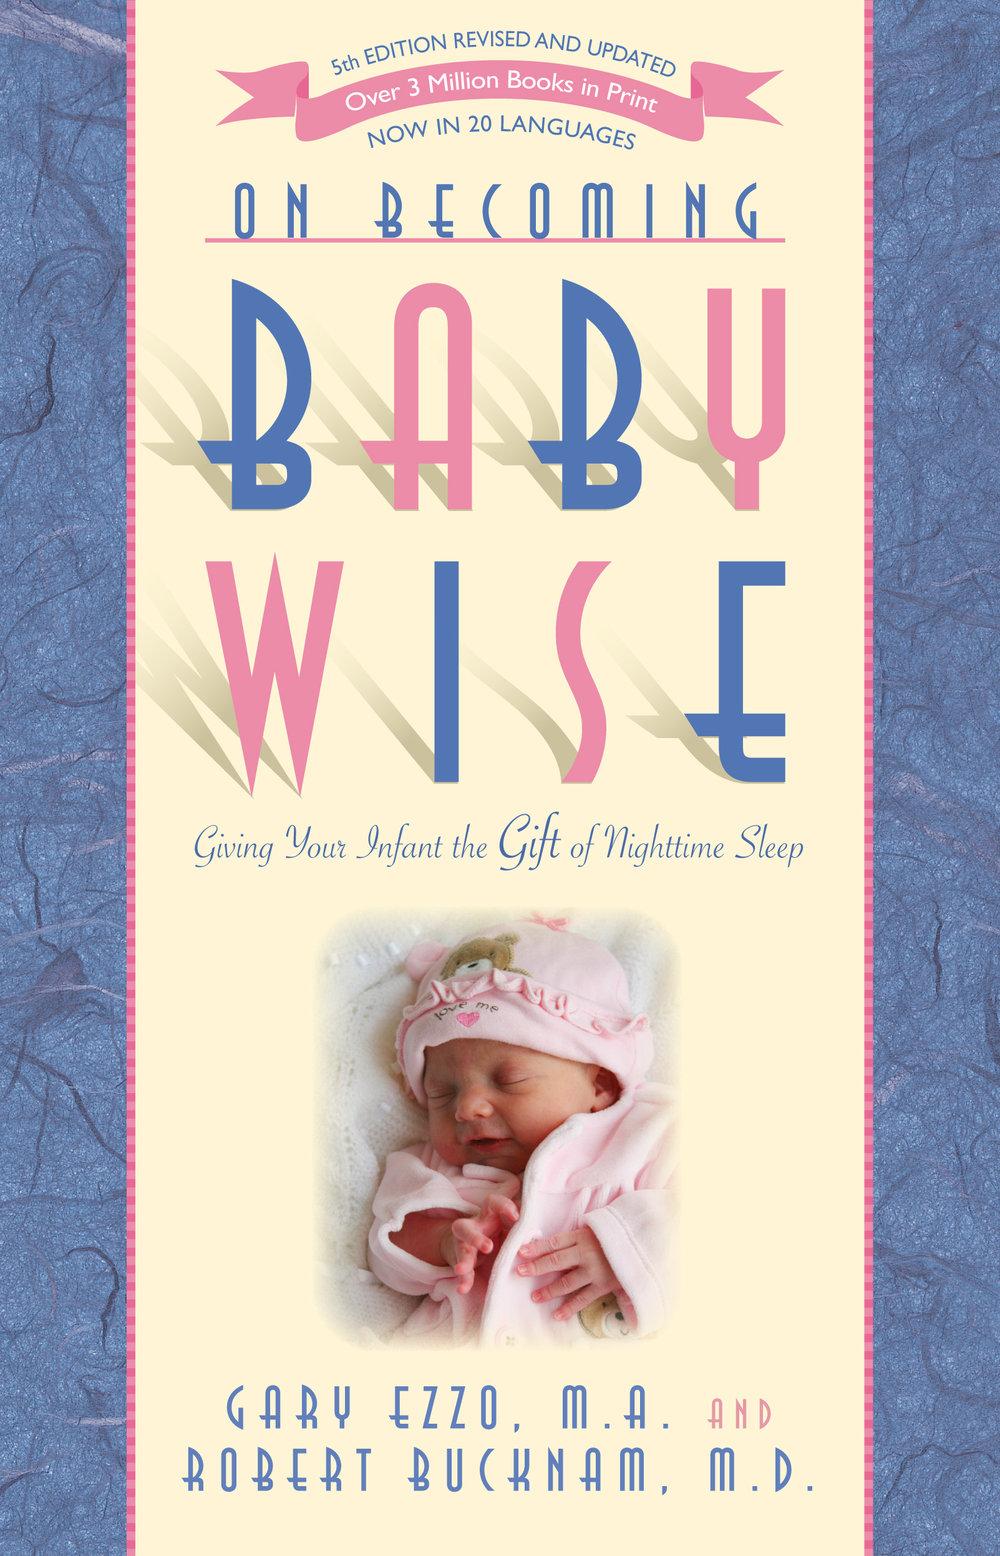 Babywise Cover 2016 PRESS.jpg